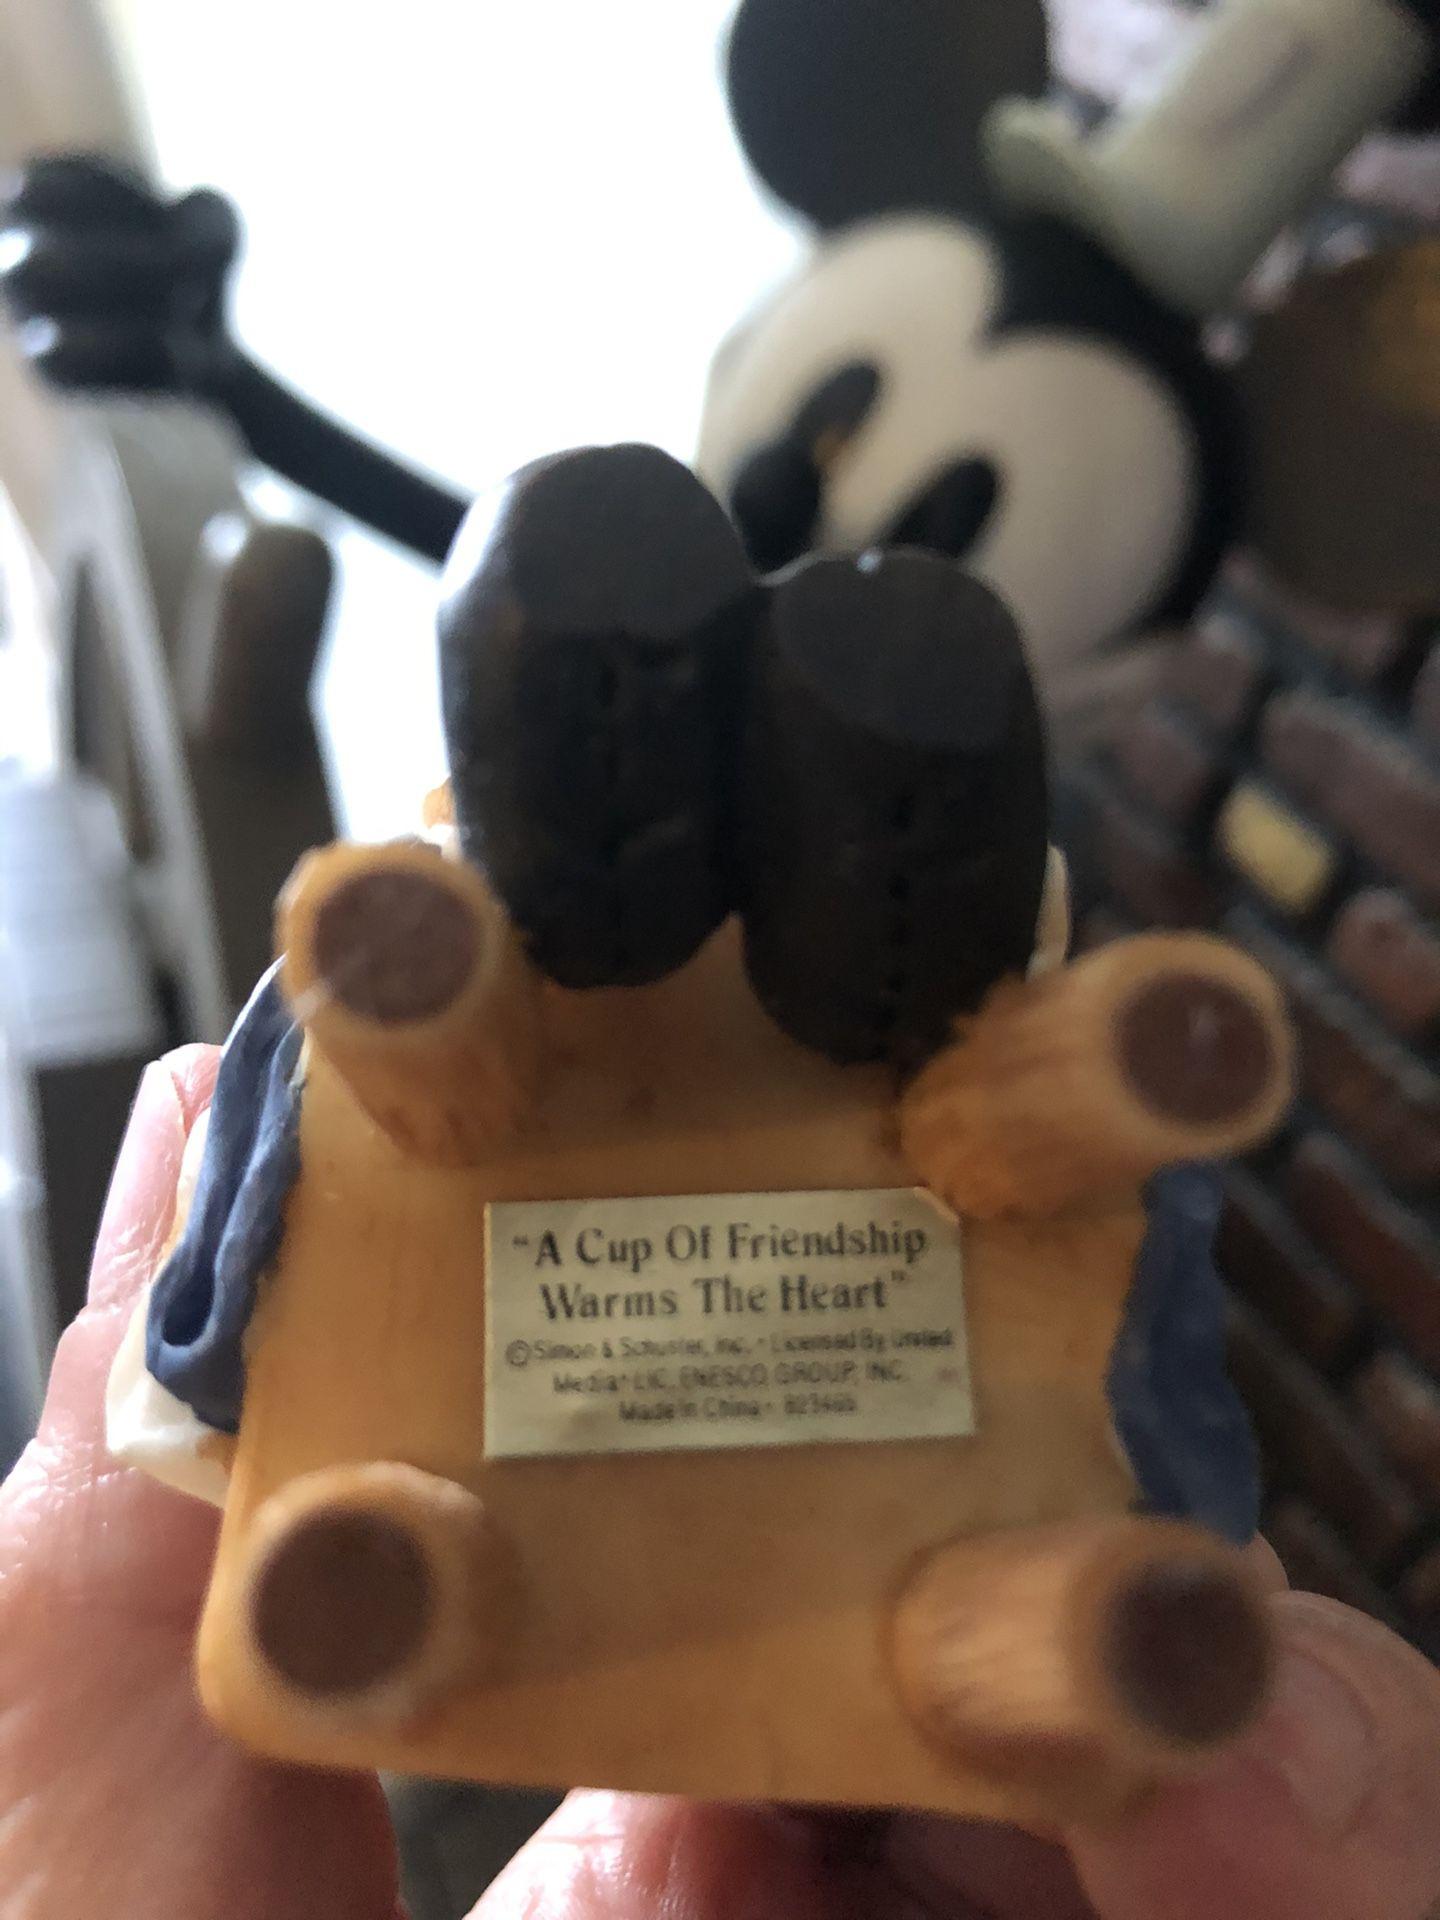 Raggedy Ann and Andy figurine